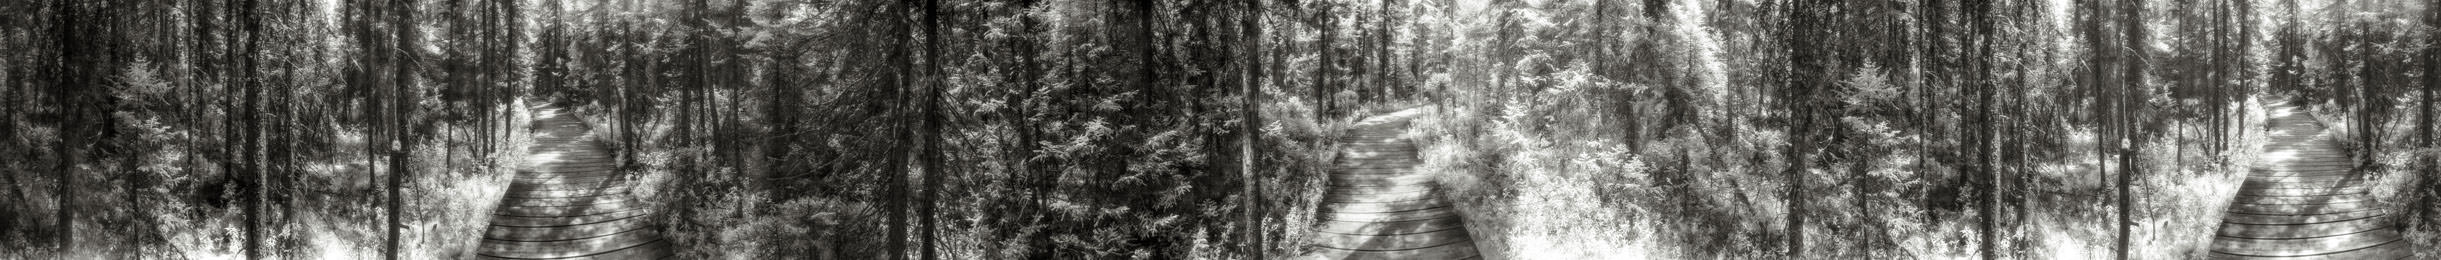 """Spruce Bog Trail 1"" from the series Footprints, by William Mokrynski"